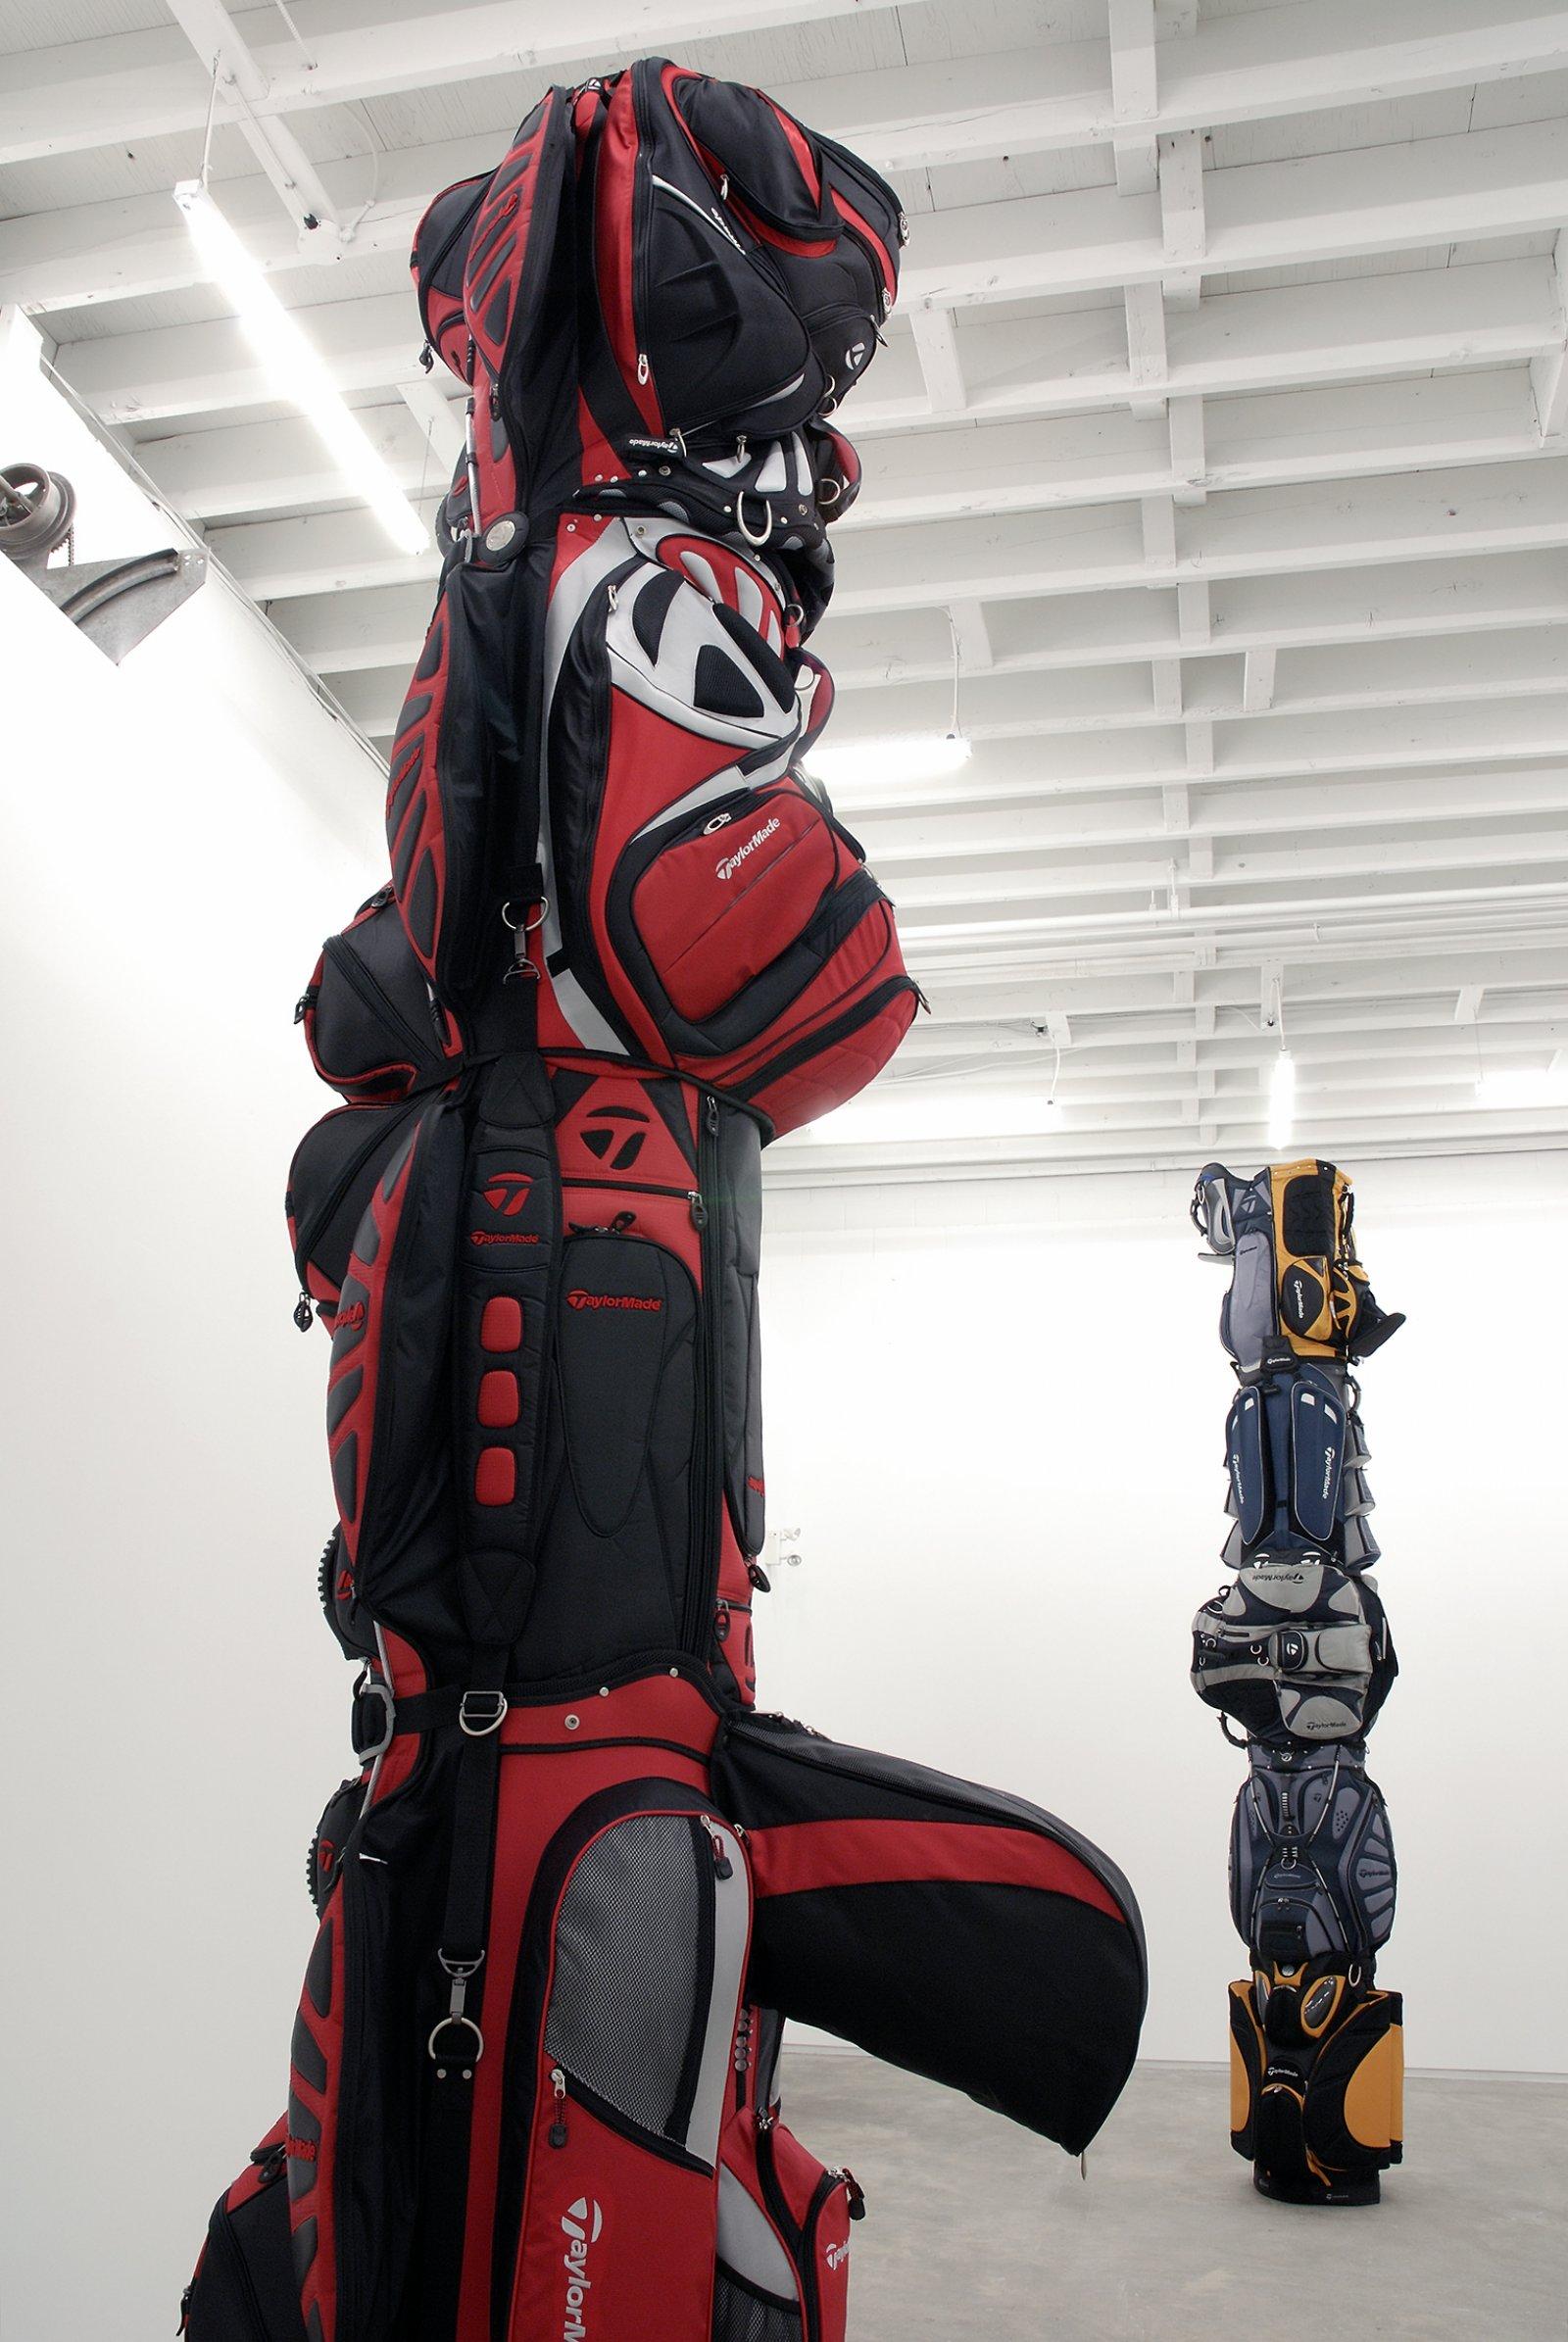 Brian Jungen, 2000, 2007, golf bags, cardboard tube, 146 x 30 x 38 in. (371 x 76 x 97 cm) by Brian Jungen